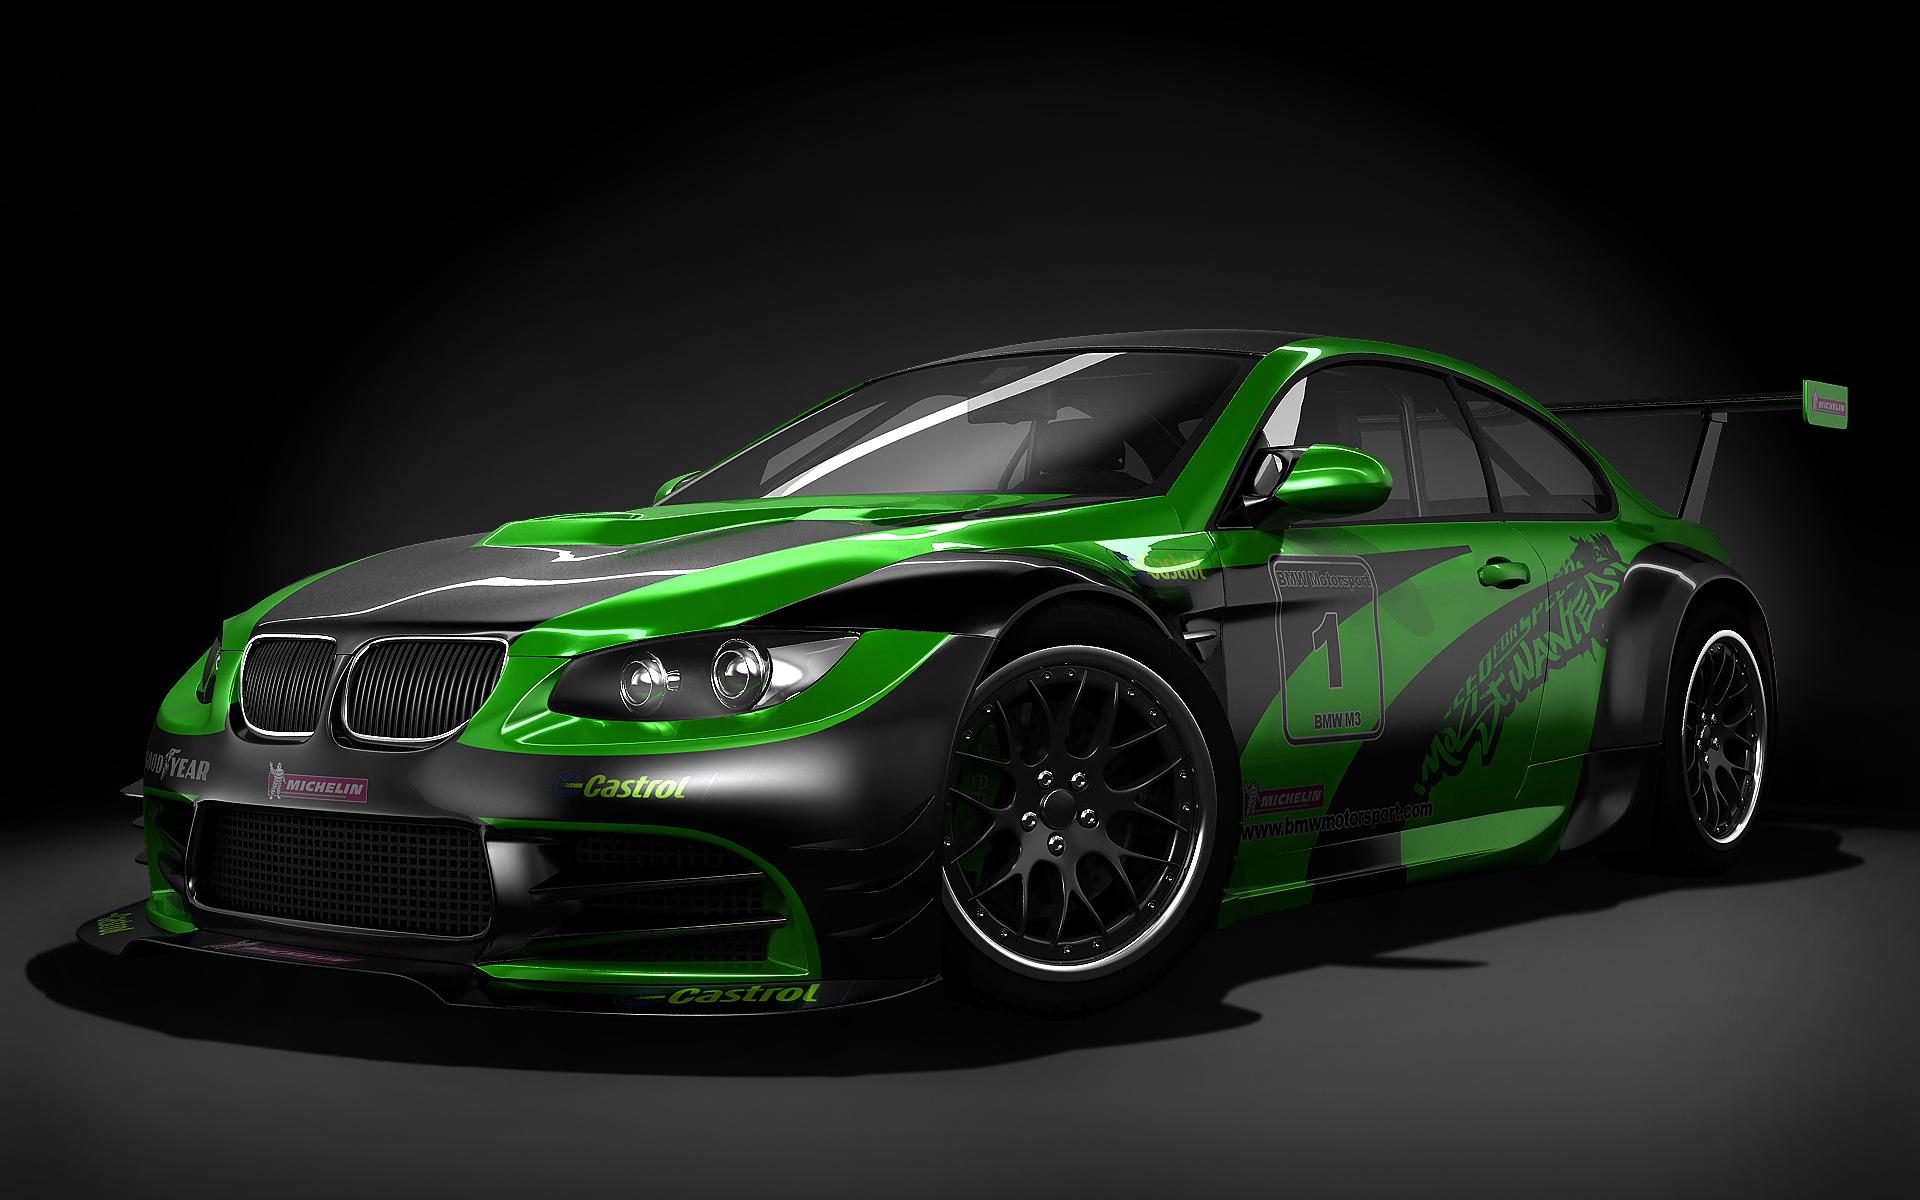 BMW M3 GTR Black Wallpapers | Wallpup.com